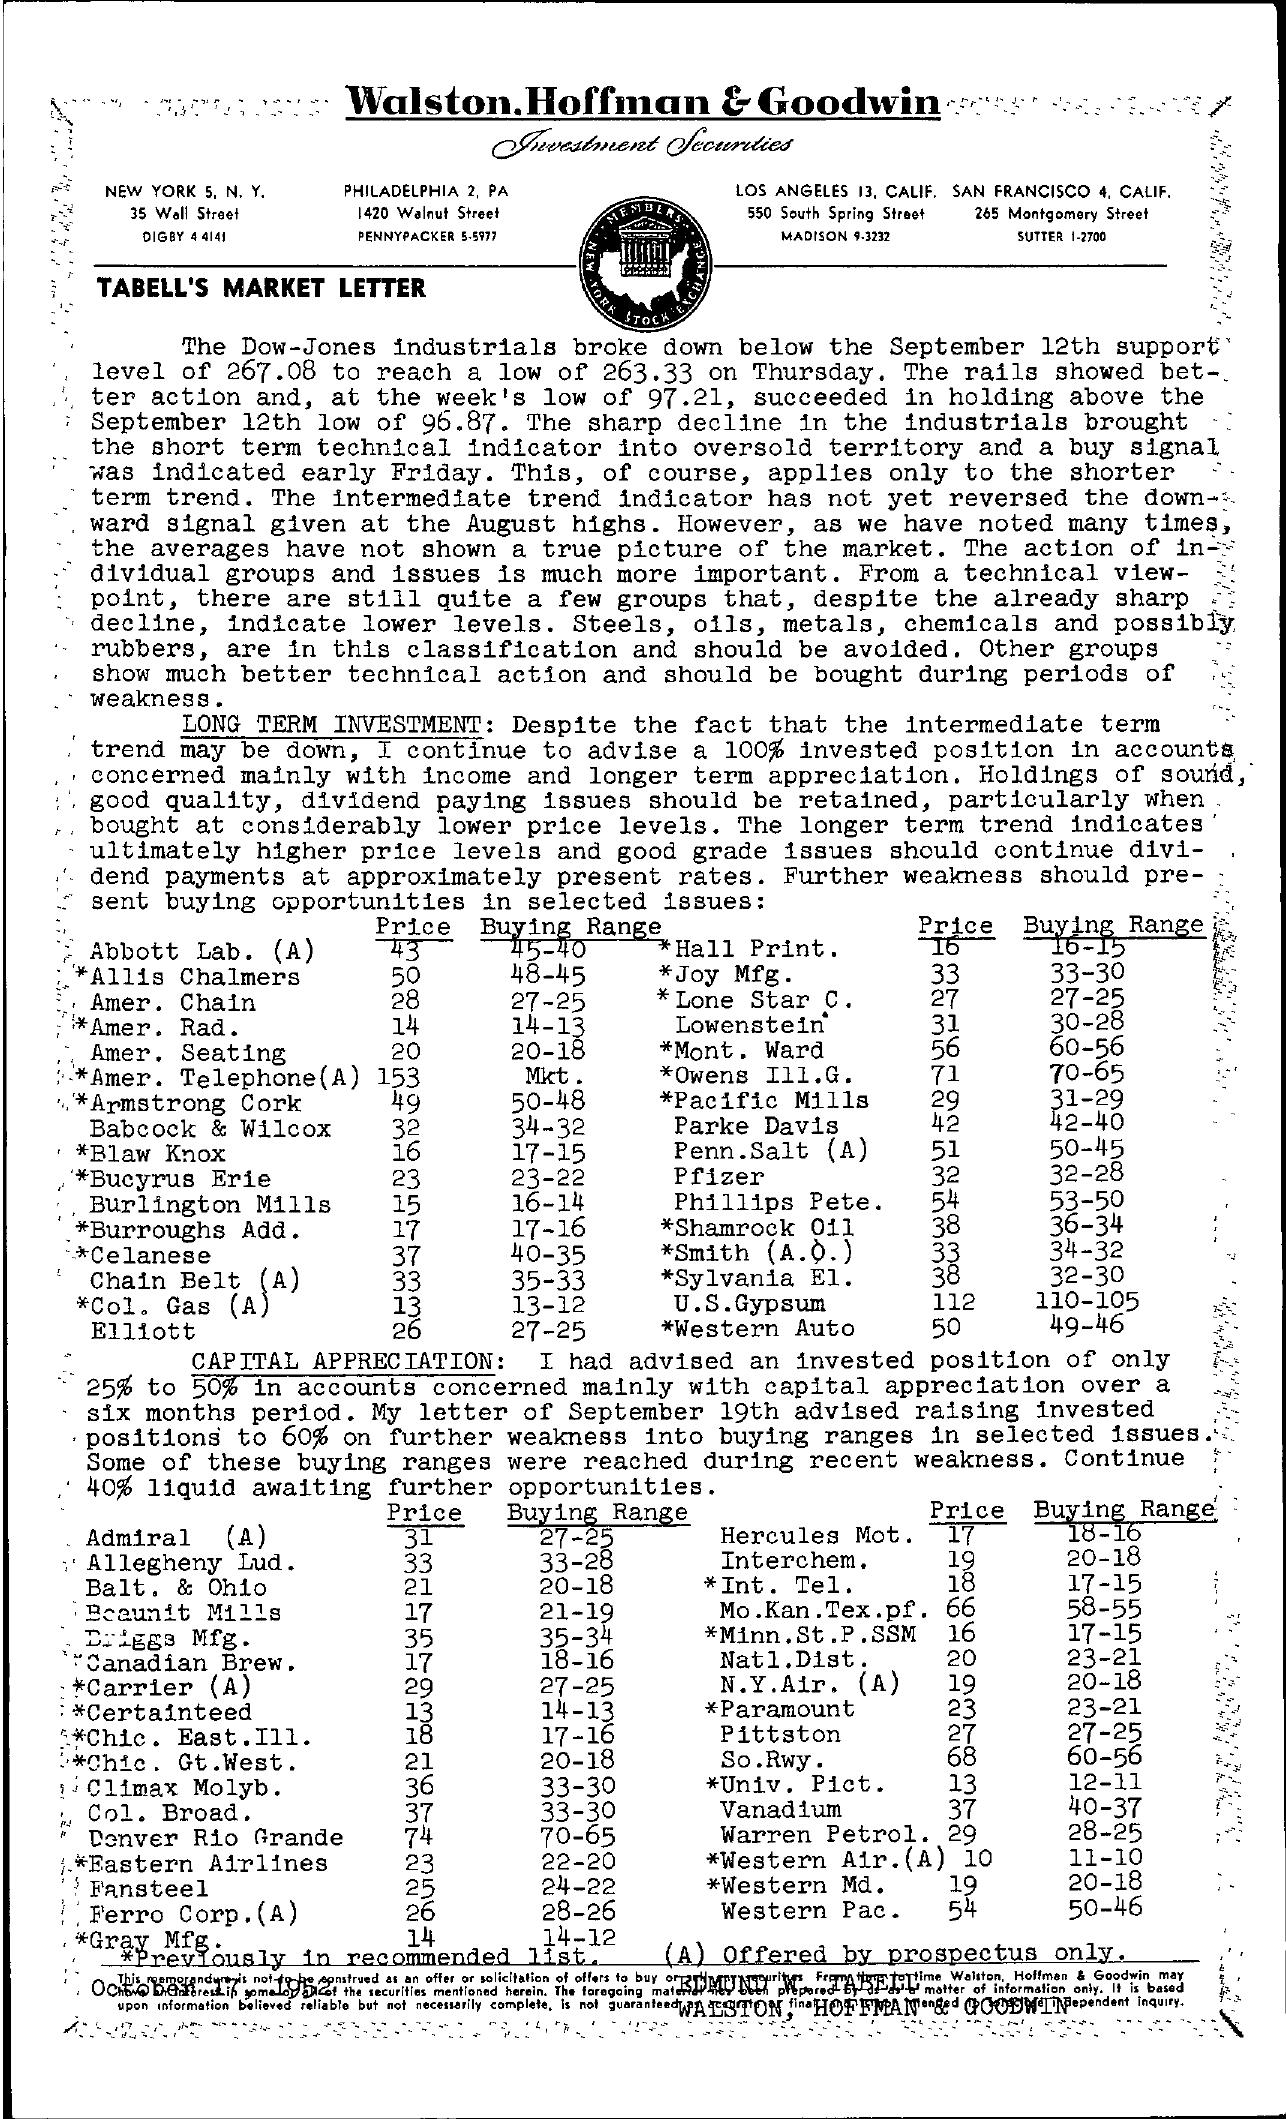 Tabell's Market Letter - October 17, 1952